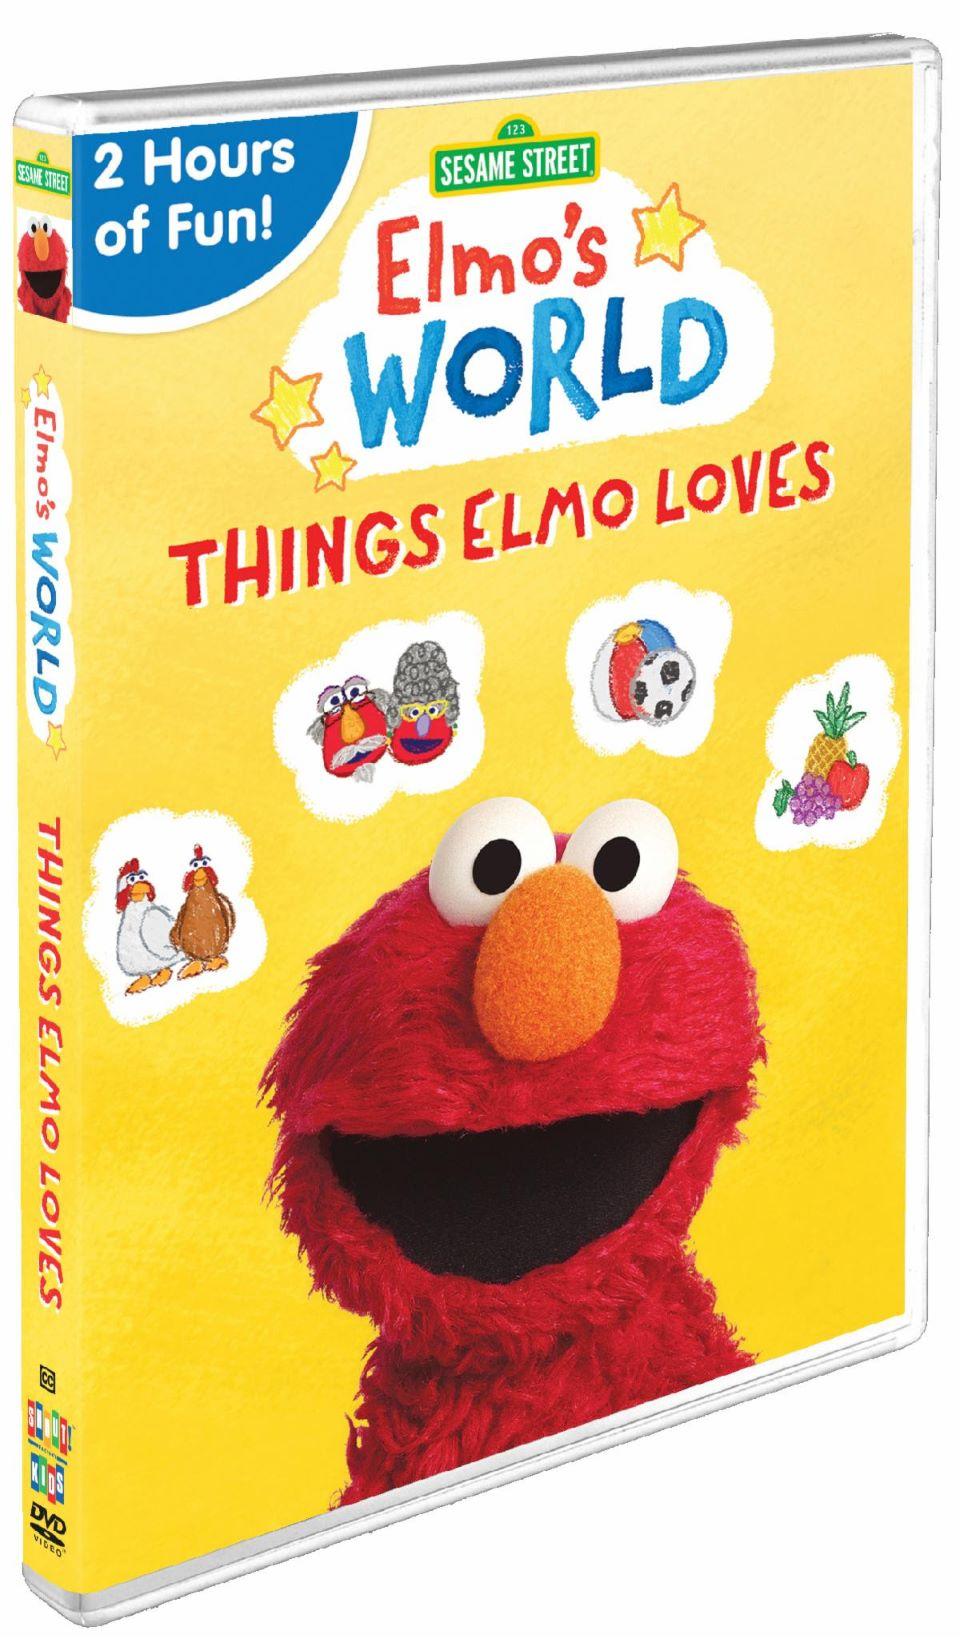 Sesame Street release Elmo's World: Things Elmo Loves DVD Giveaway